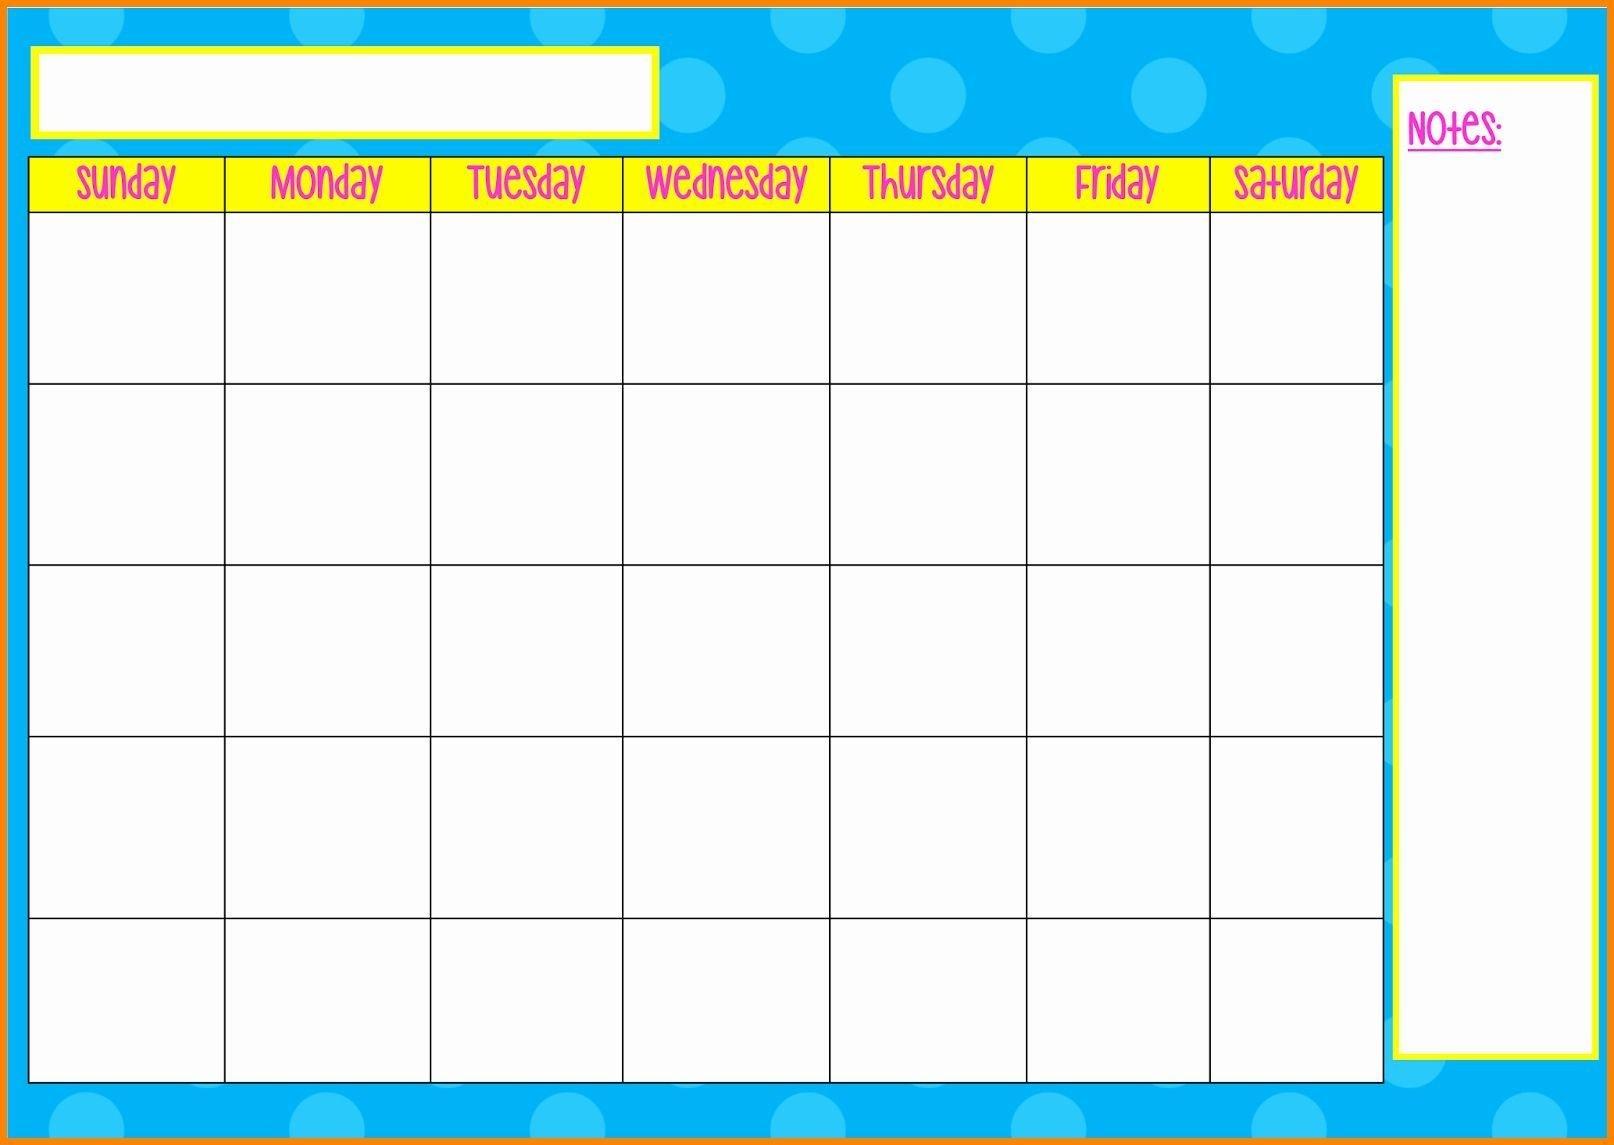 How To Monday Through Friday Calendar Word   Get Your Free Blank 1 Week Calendar Monday Through Friday